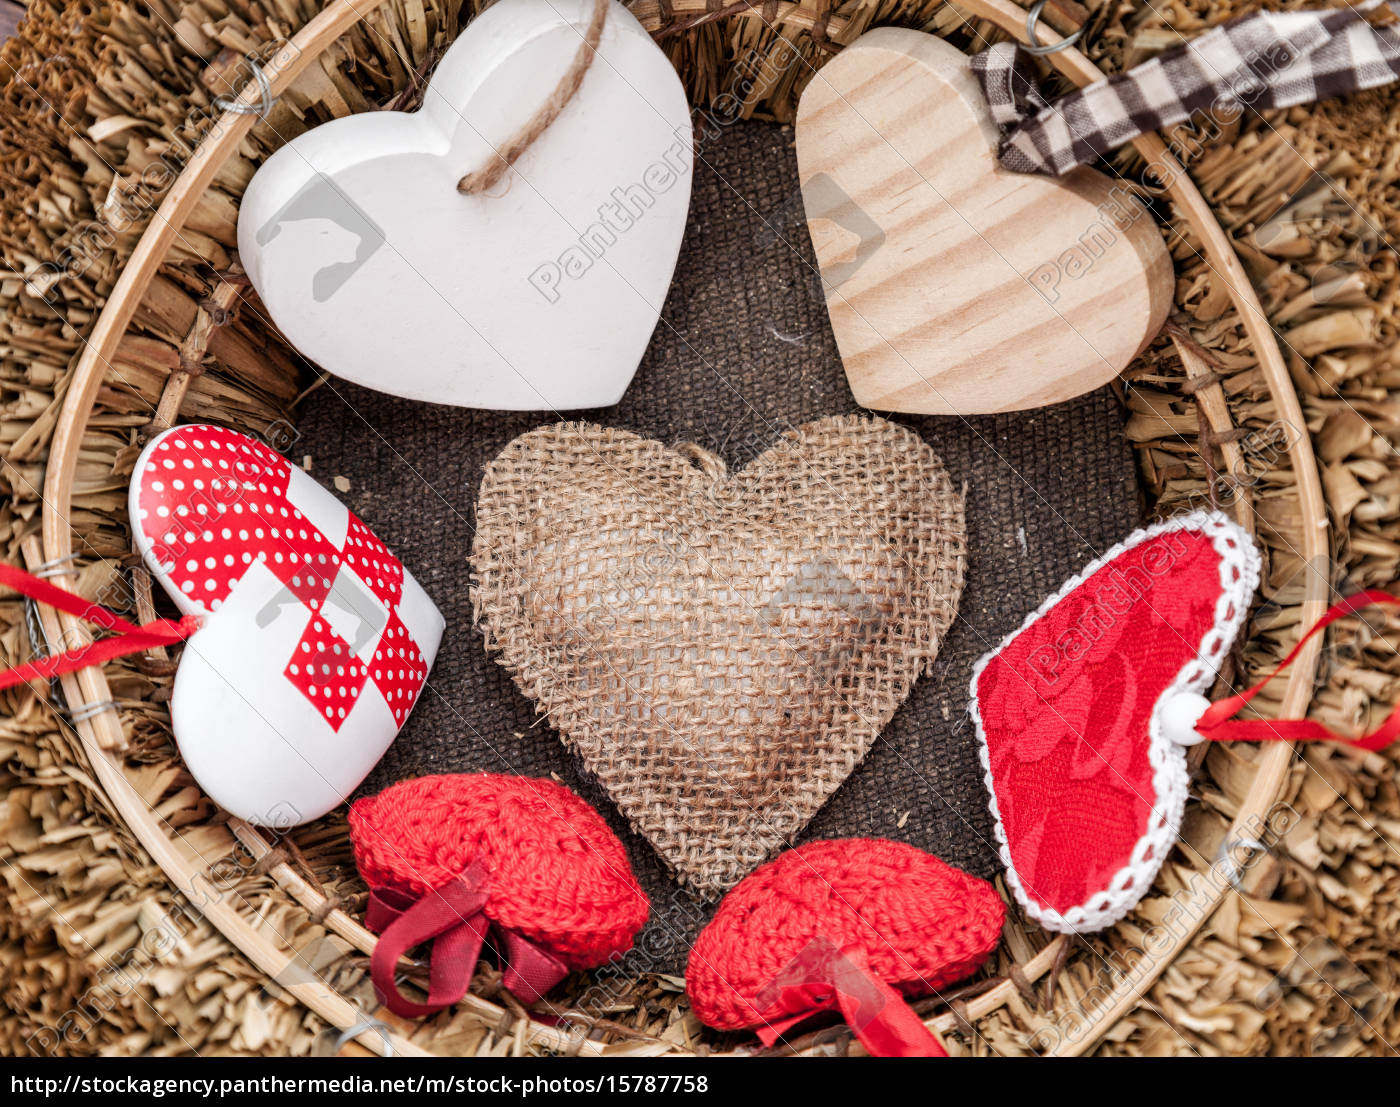 many, hearts, inside, a, wooden, basket - 15787758